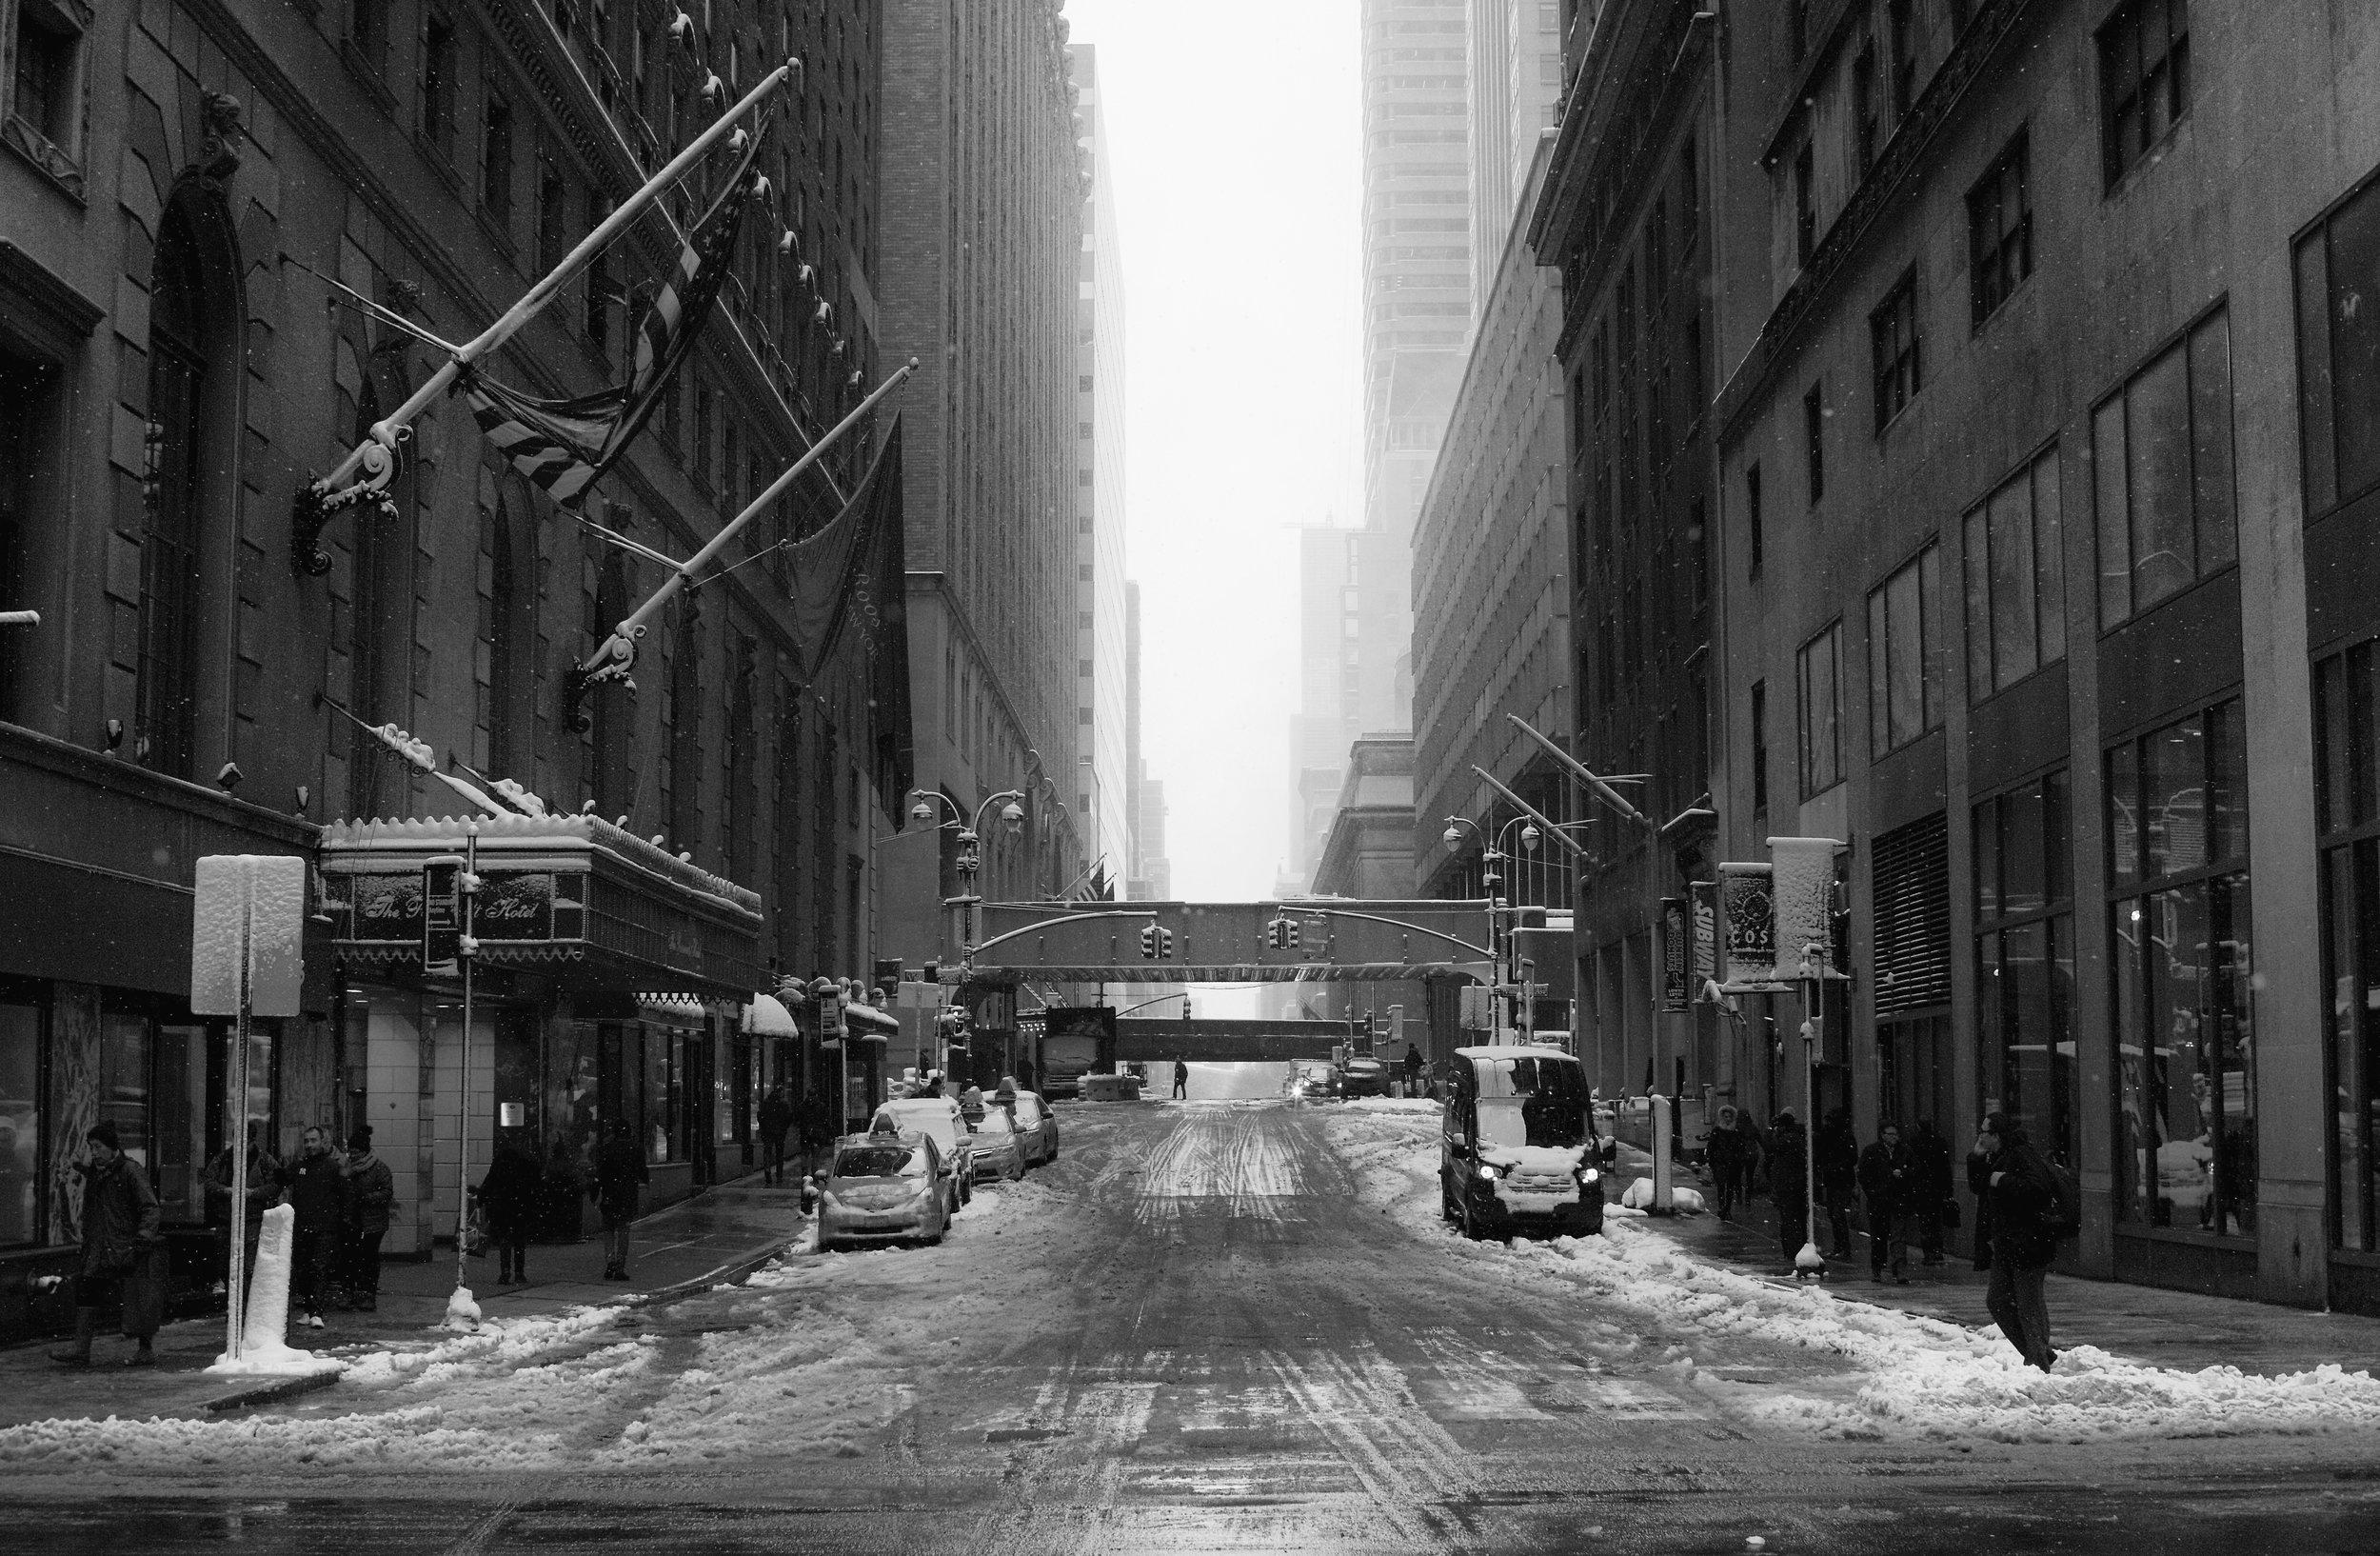 East 45th Street